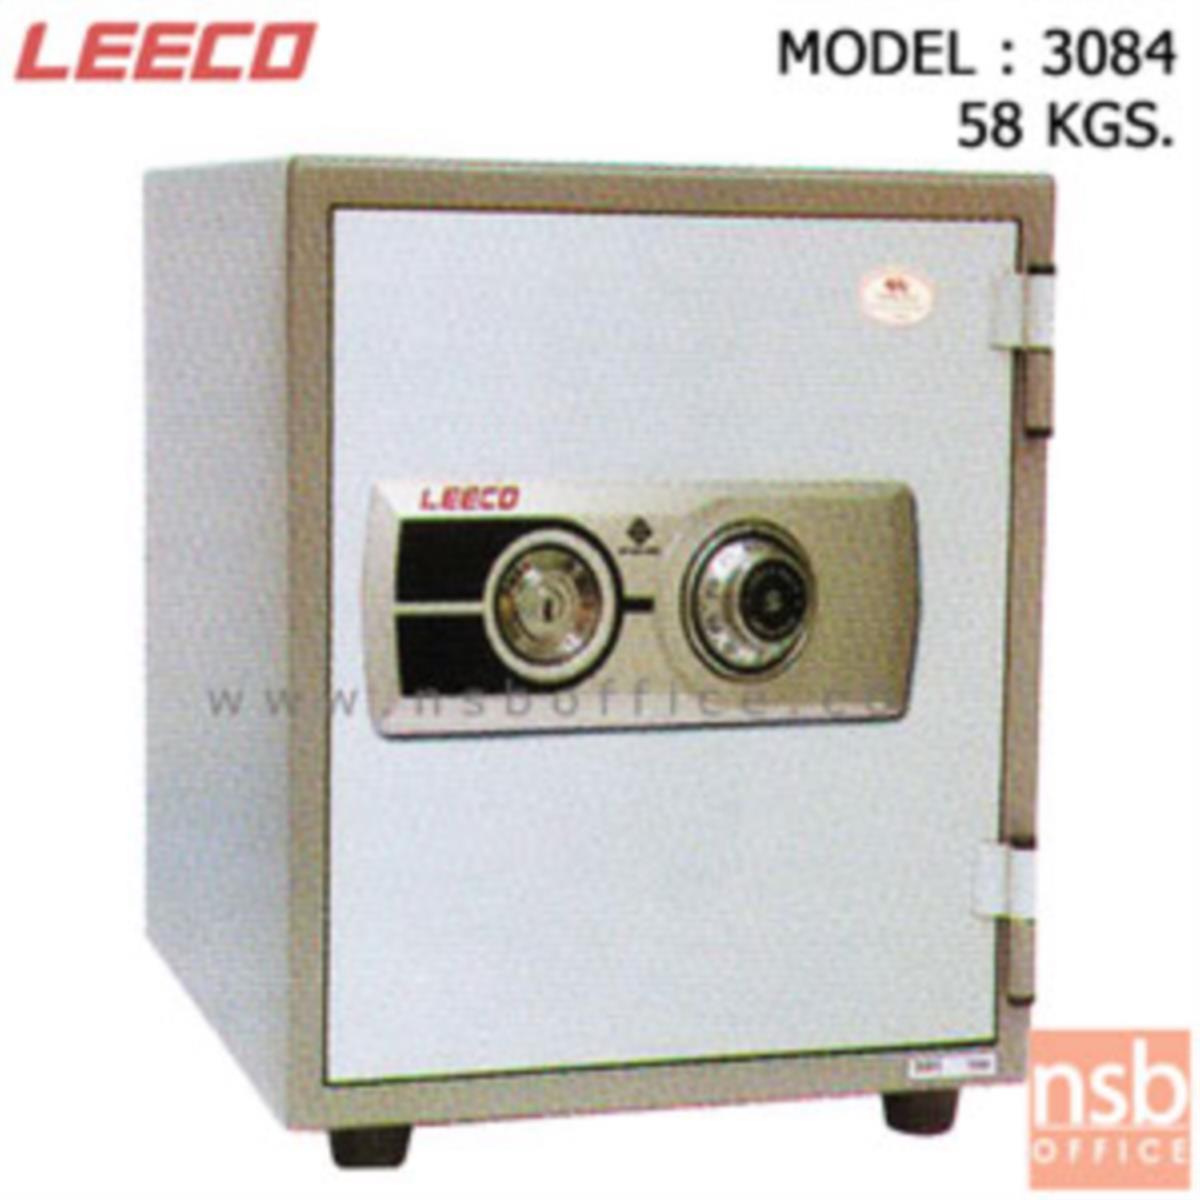 F02A047:ตู้เซฟนิรภัย 58 กก.(แนวตั้ง) ลีโก้ รุ่น 3084 มี 1 กุญแจ 1 รหัส